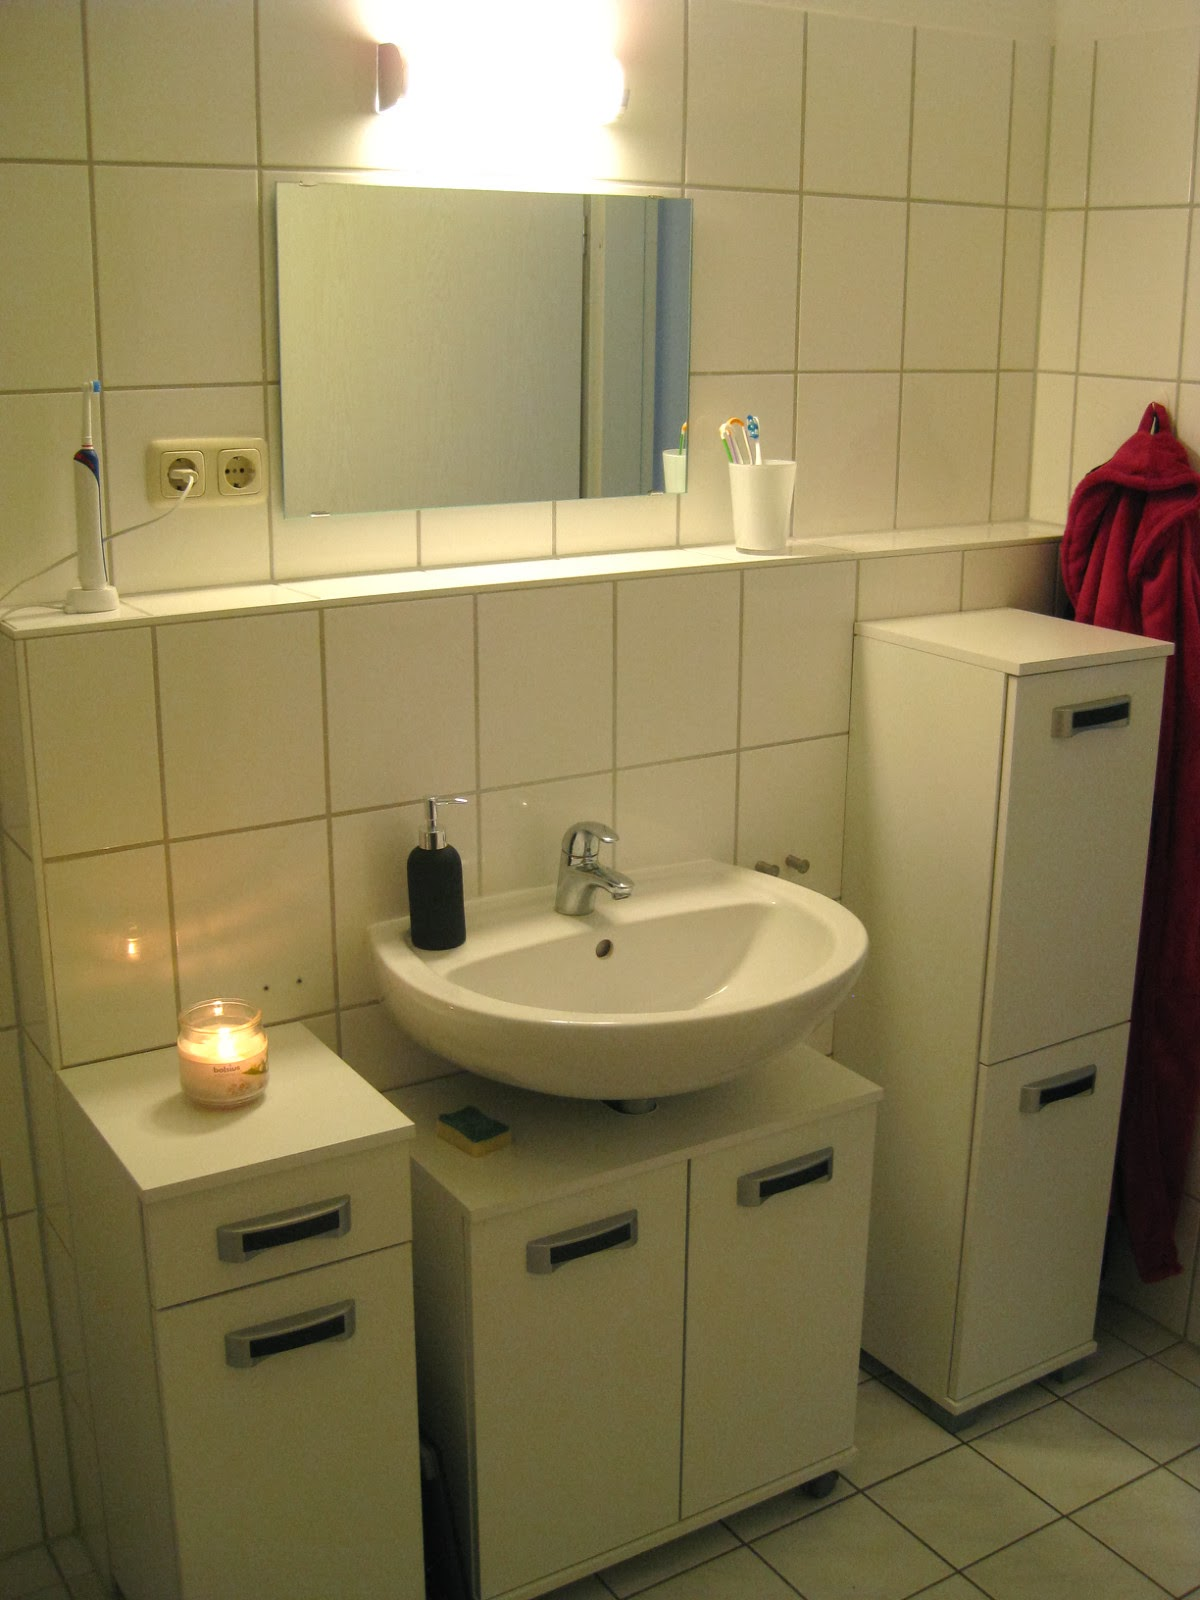 Bathroom In German german apartment tour: bathroom – welcome to germerica